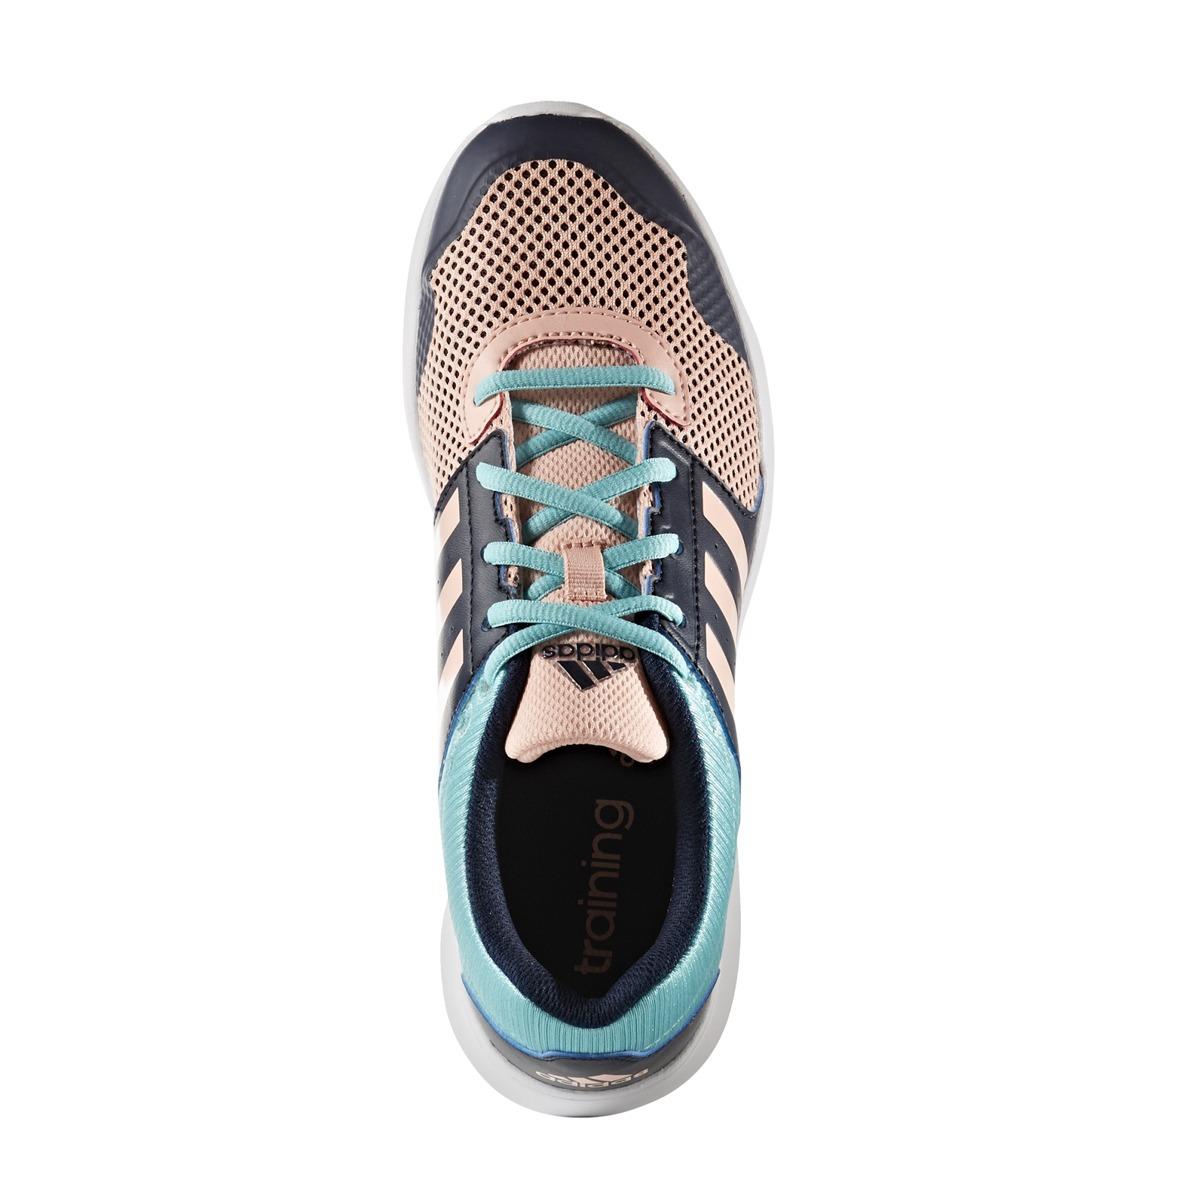 100% authentic ff82c c916e Cargando zoom... adidas mujer zapatillas. Cargando zoom... zapatillas  adidas training essential fun ii w ...